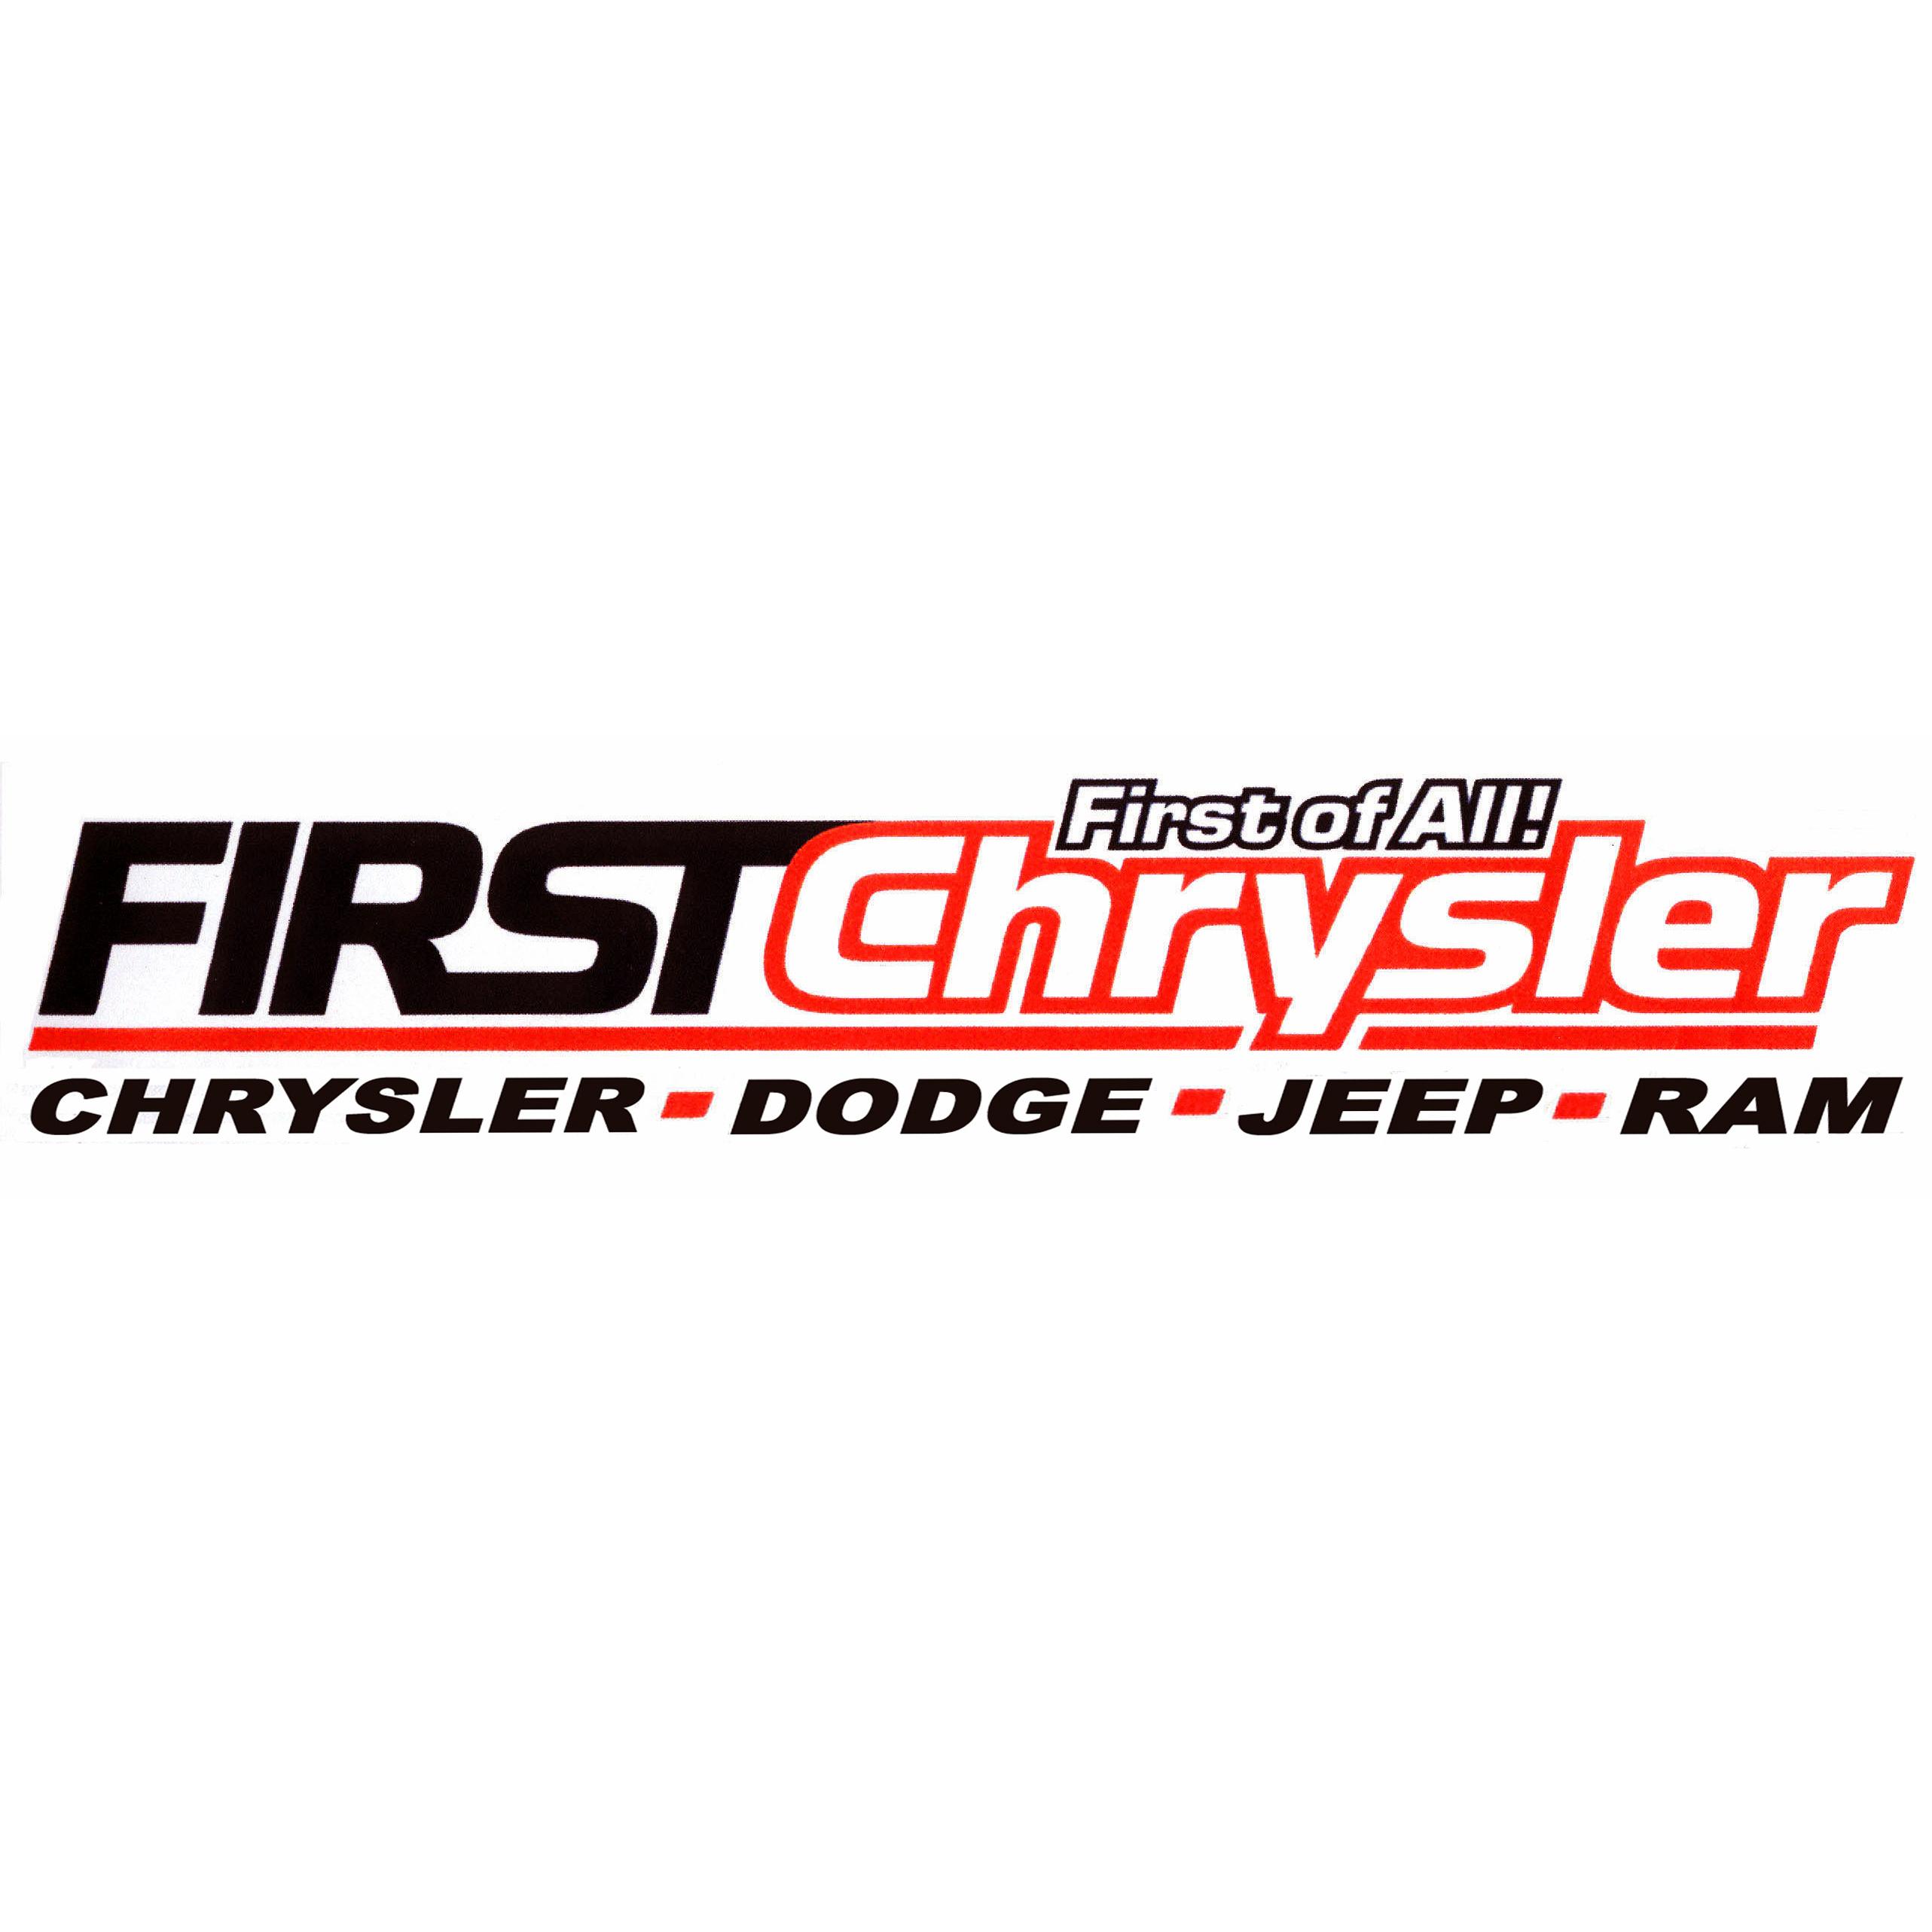 Van Horn Chrysler Dodge Jeep Ram Of Manitowoc In Manitowoc